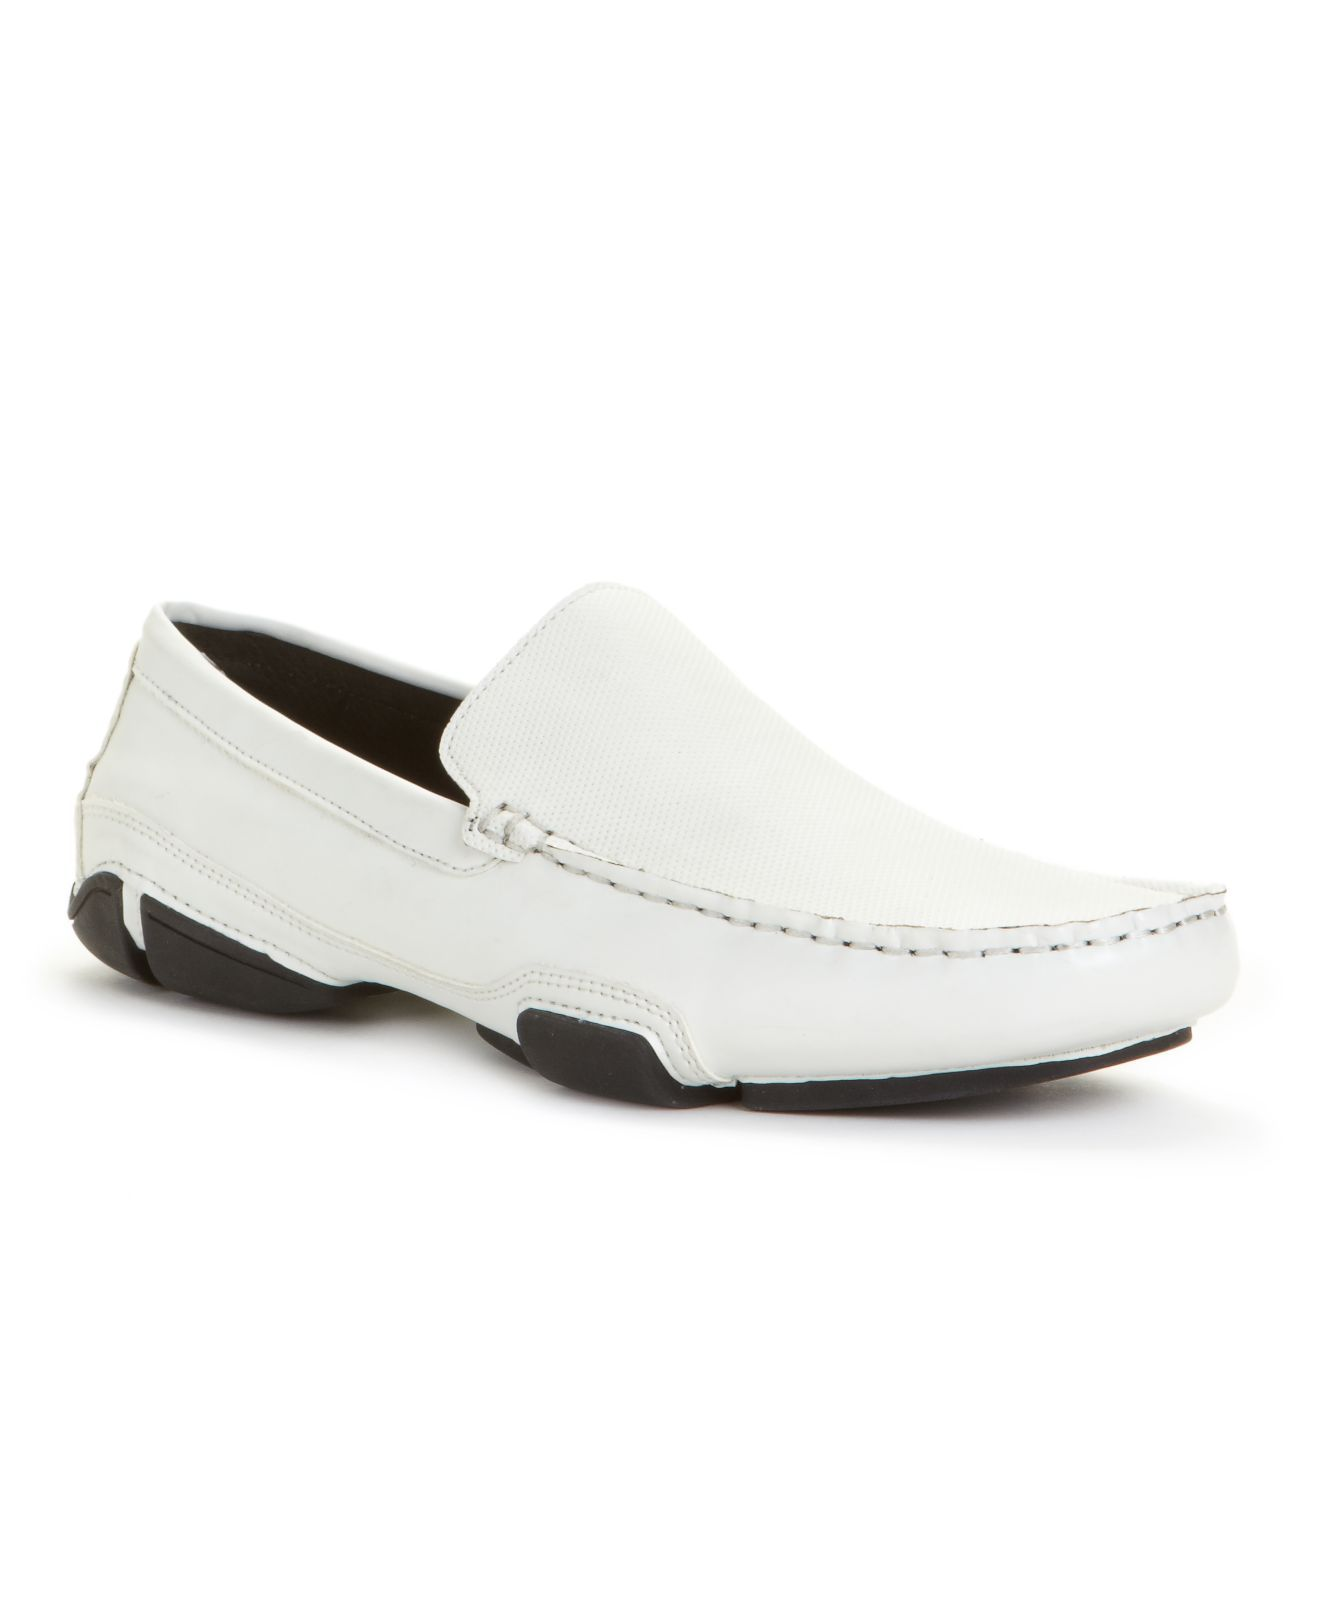 kenneth cole reaction shoes macys